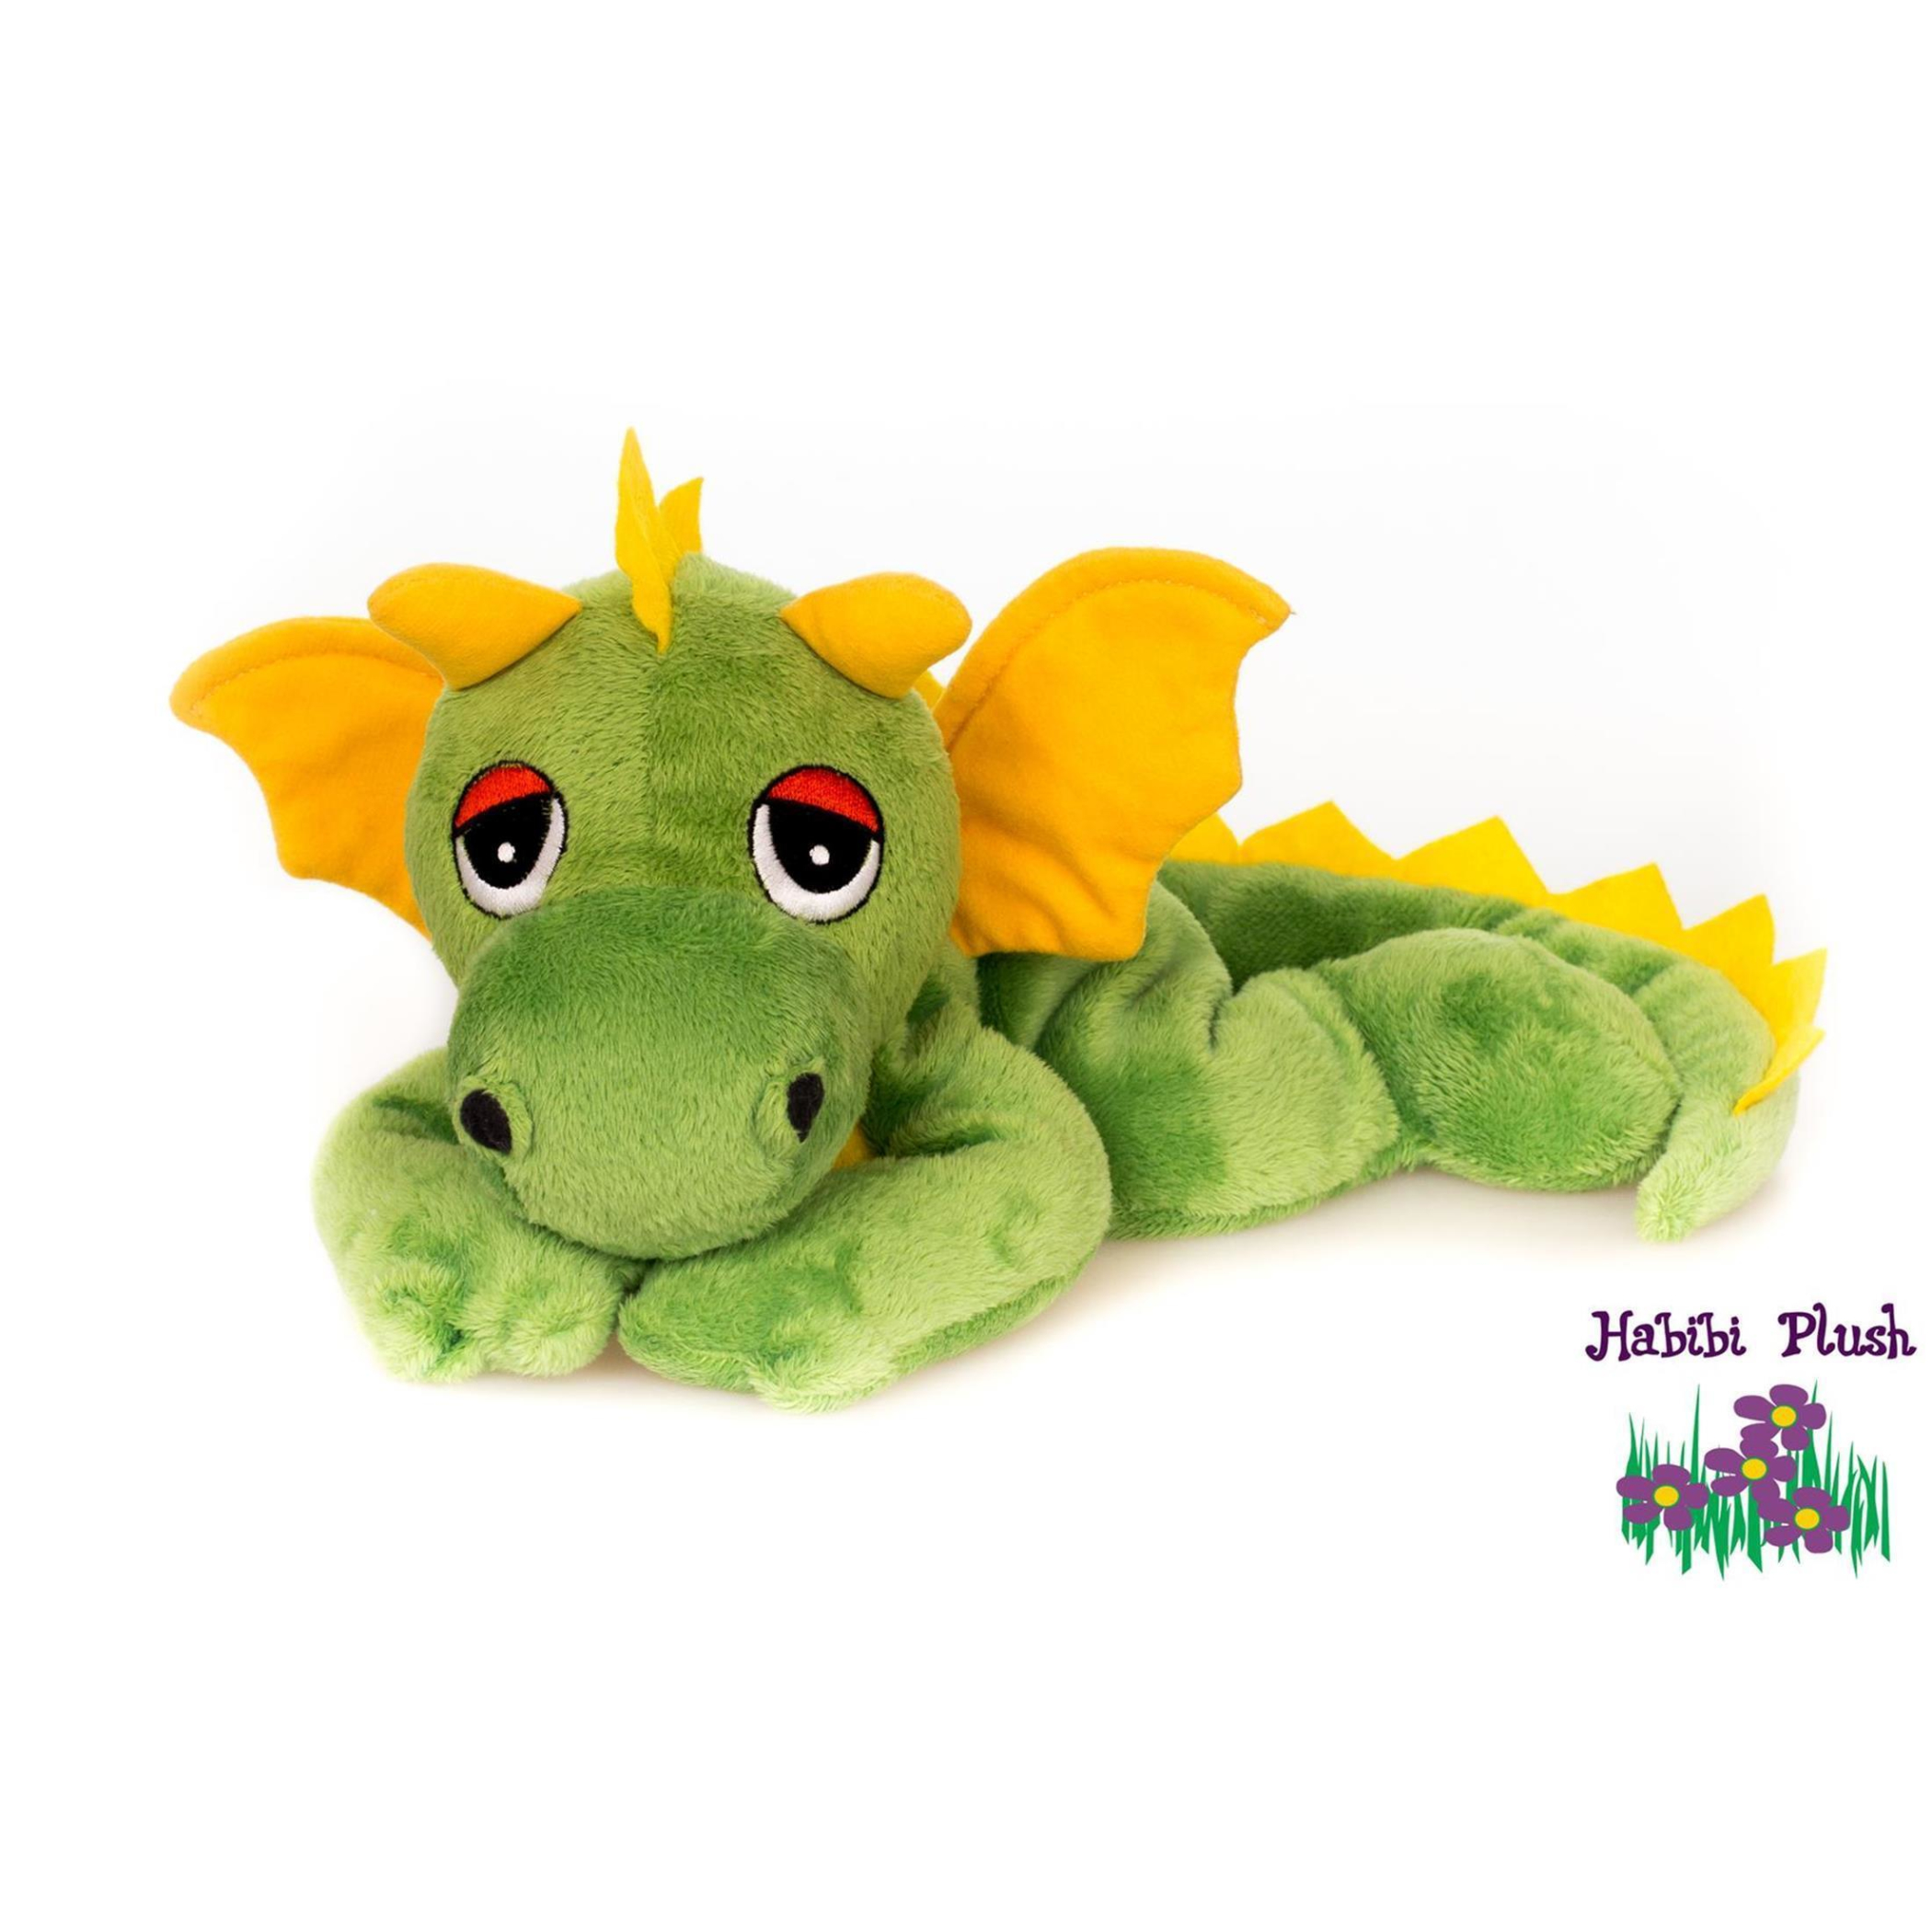 - Habibi Plush : Habibi Glücksdrache Grün/ Gelb